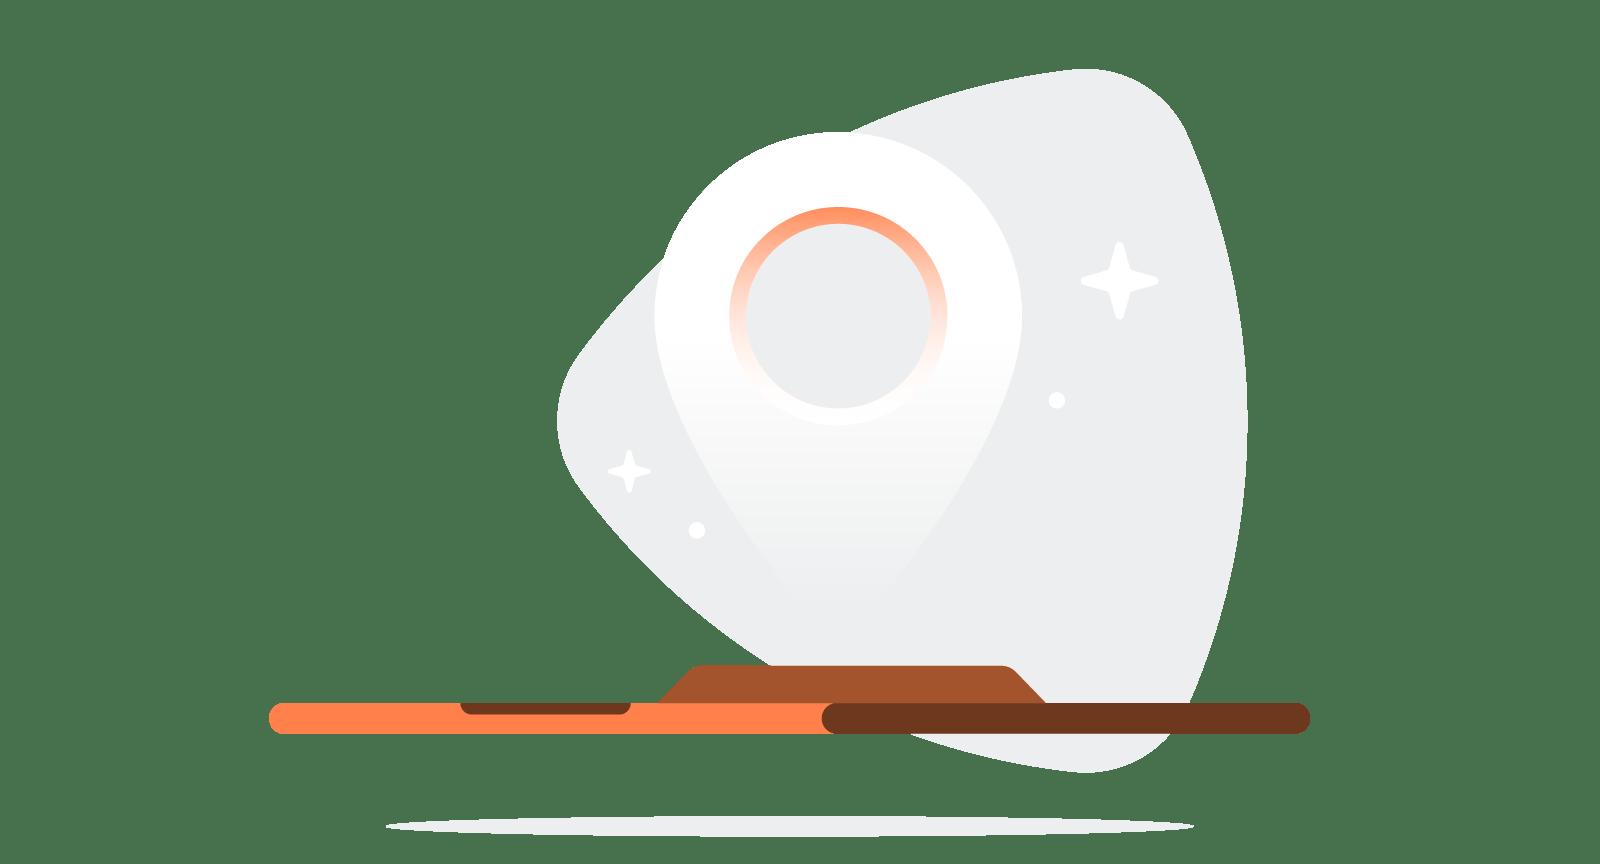 illustration for Google Maps on device